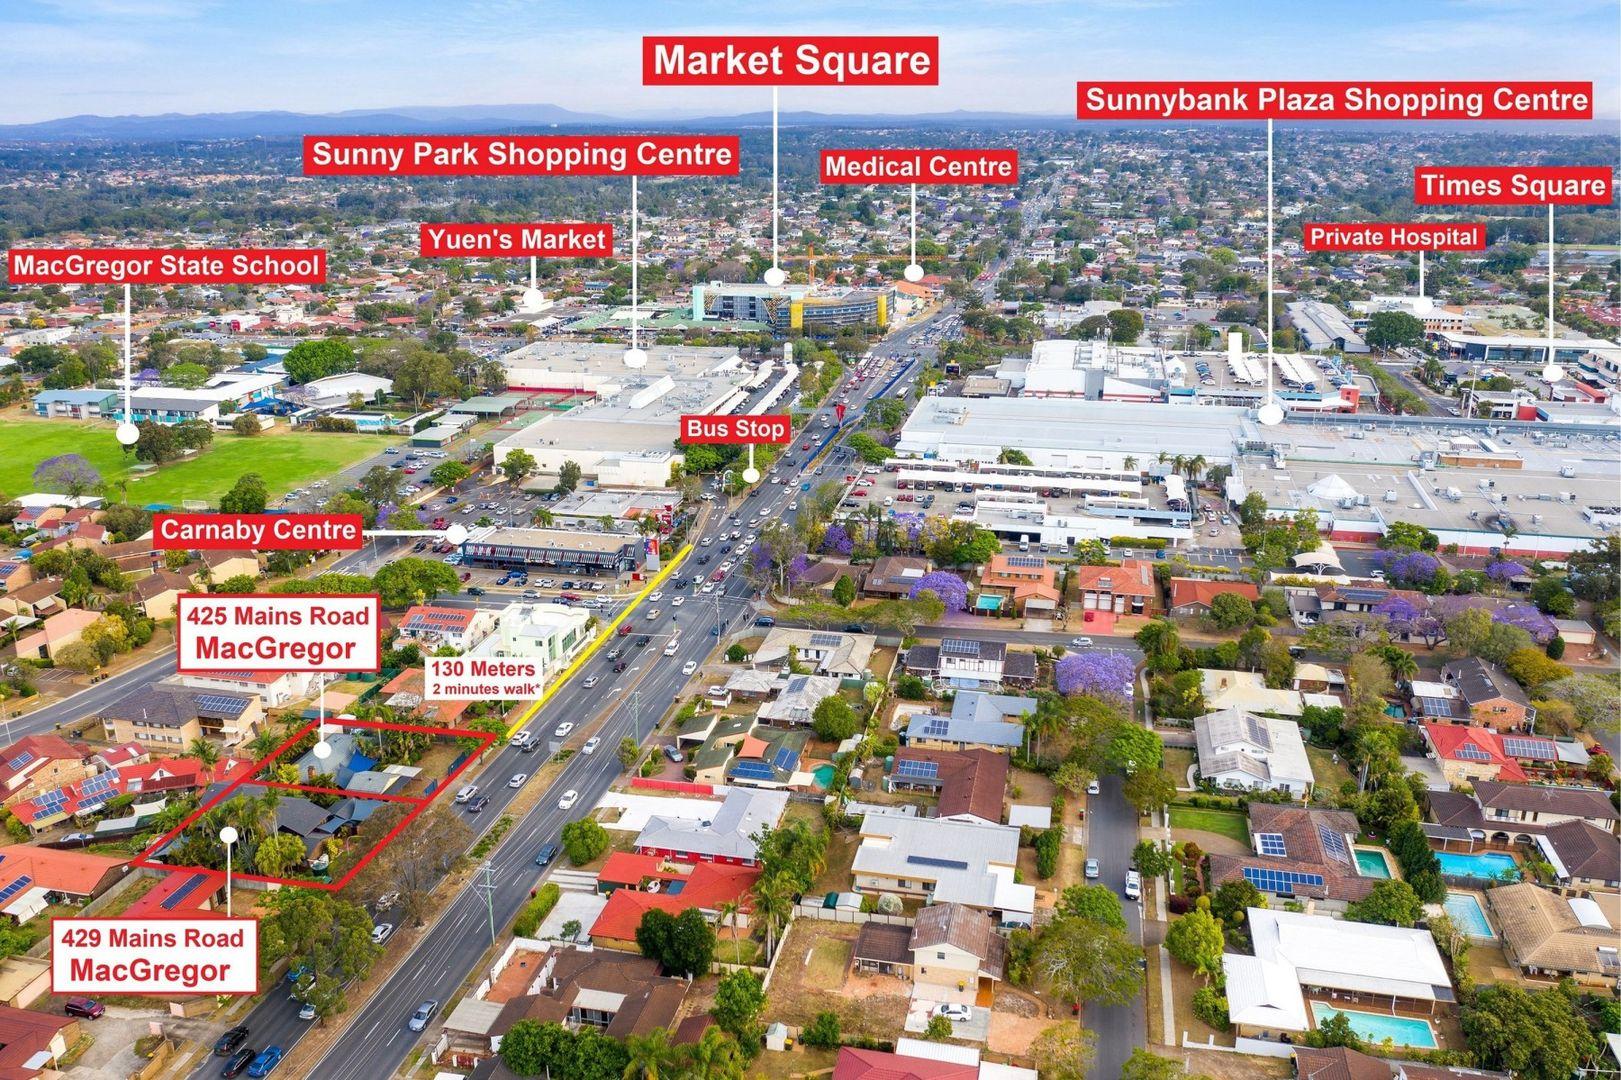 429 - 425 Mains Road, Macgregor QLD 4109, Image 1